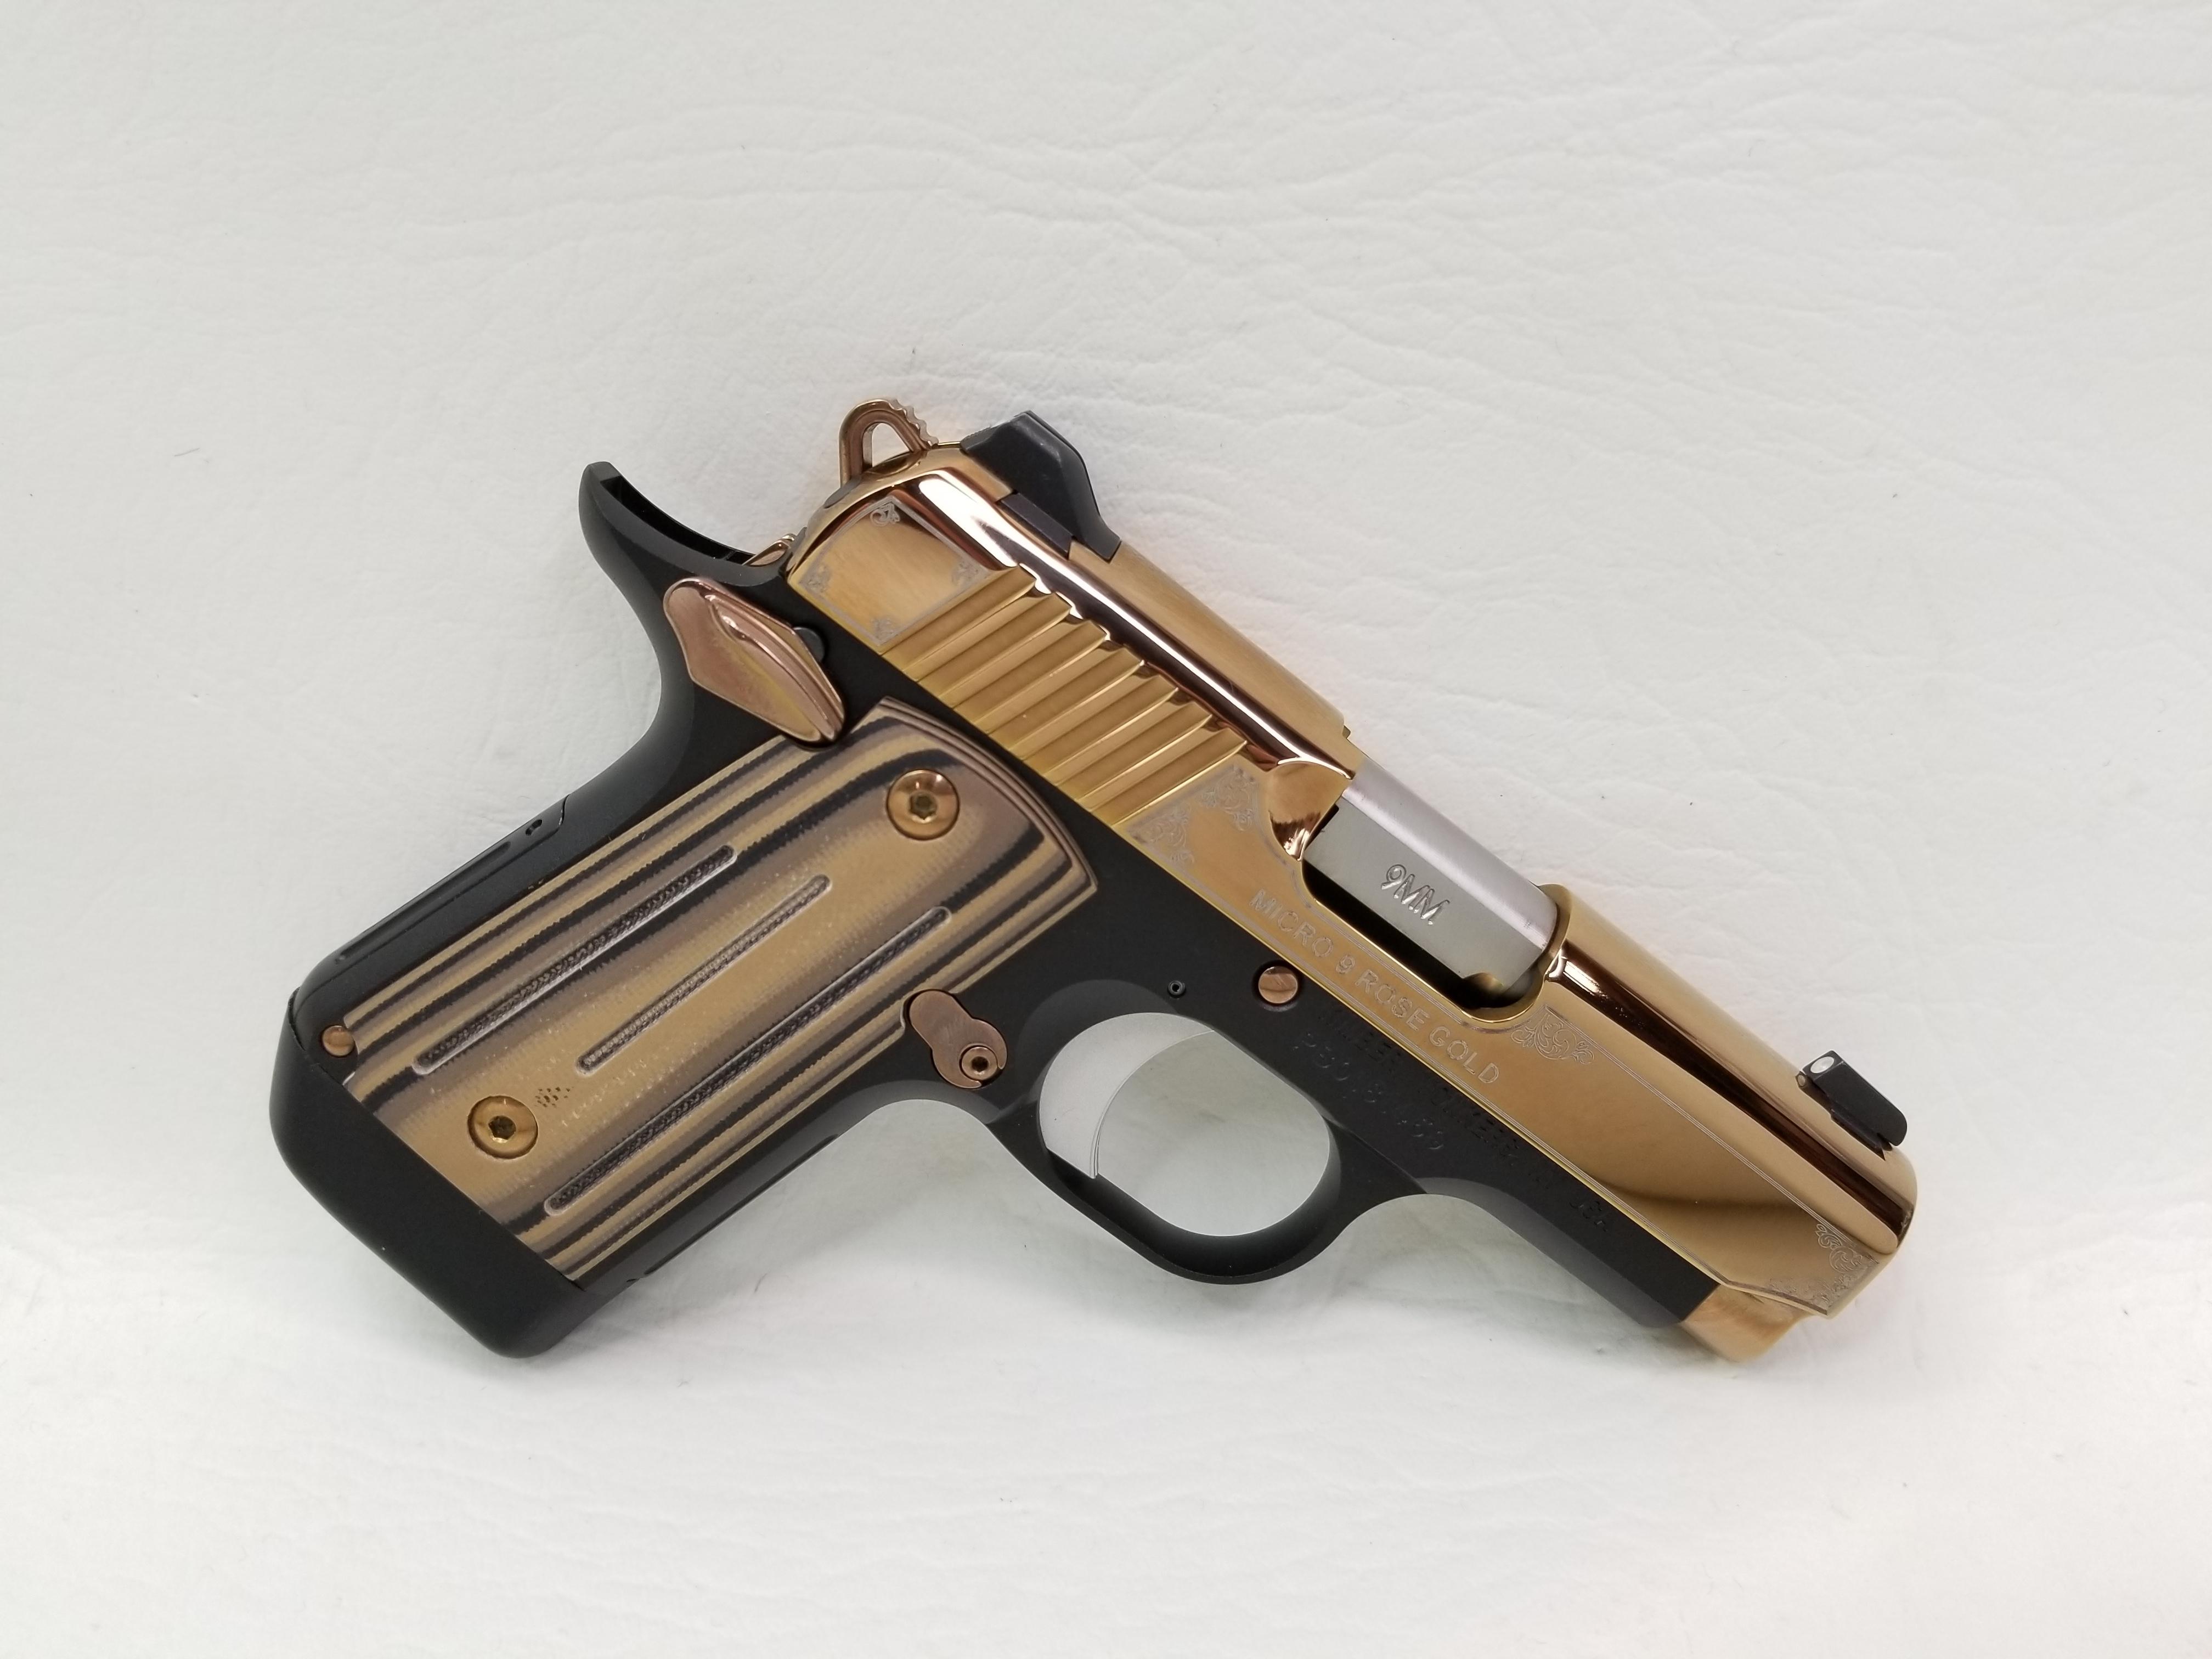 Kimber Micro 9 Rose Gold 9mm - Semi Auto Pistols at